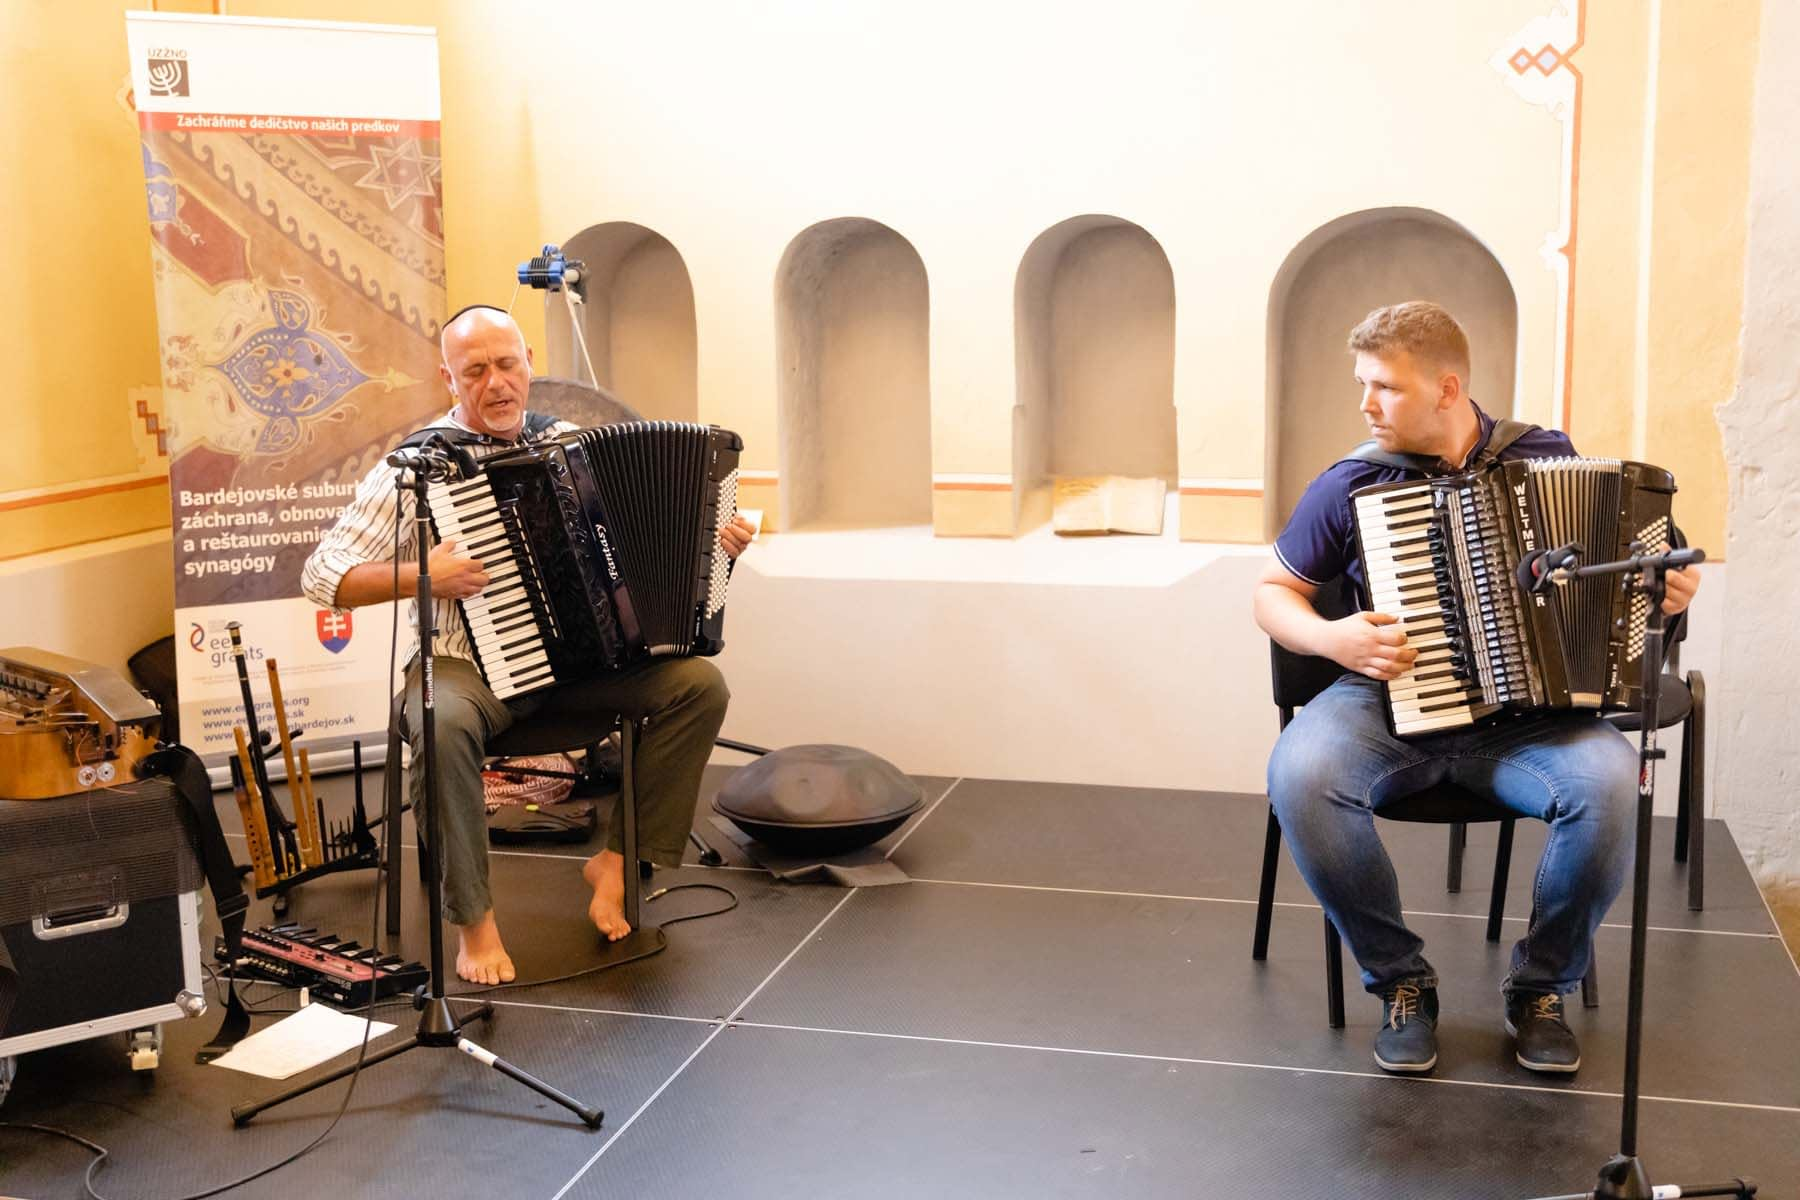 Slovak multi-instrumentalist Michal Smetanka, accompanied by accordion player Slavomír Harman, play a Jewish melody